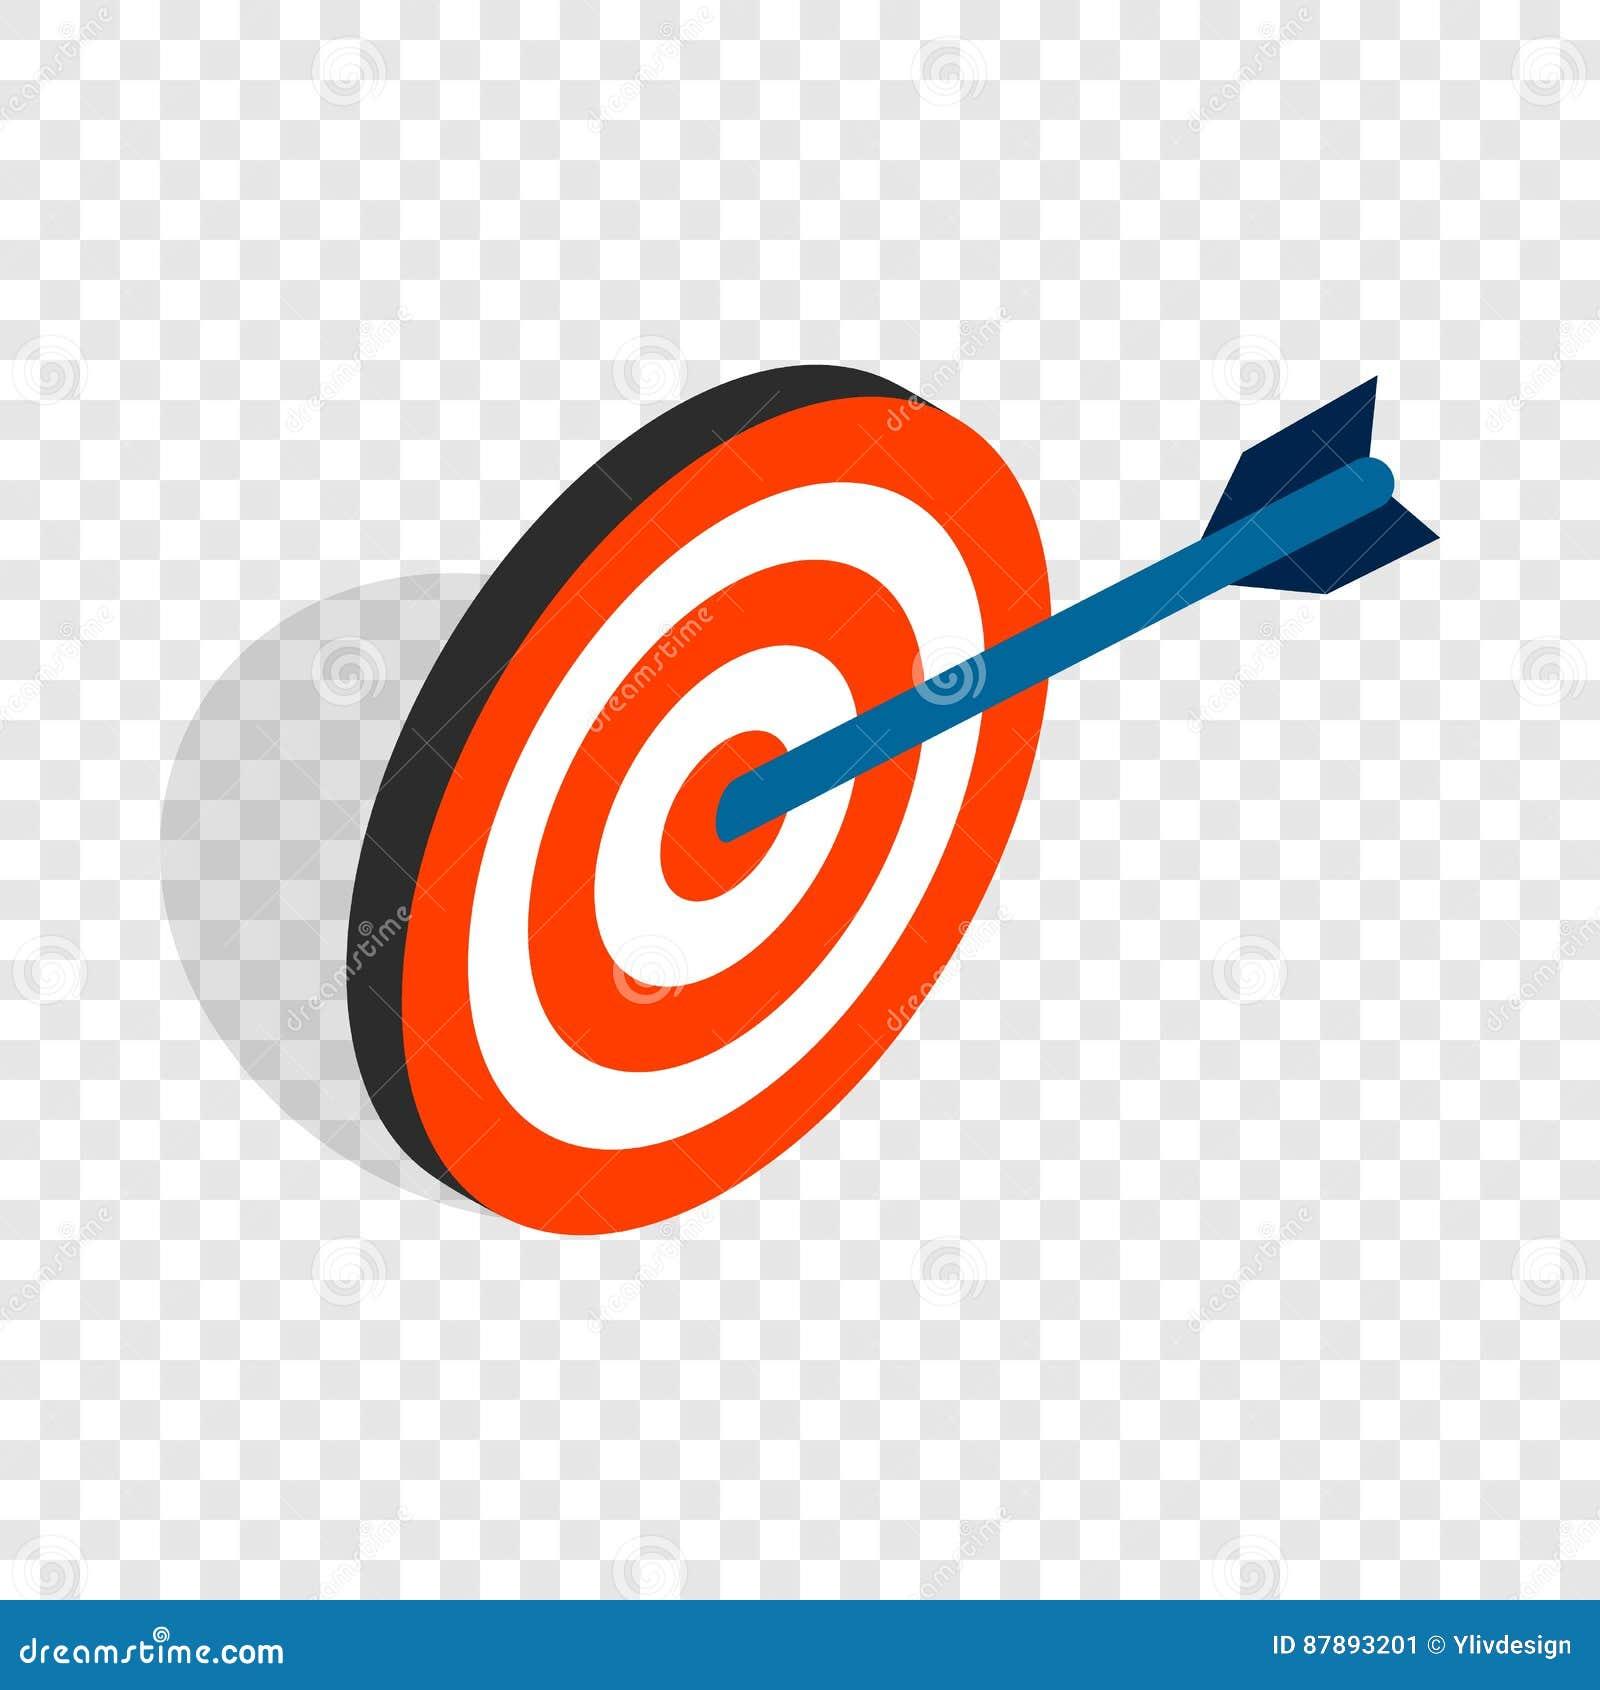 Target With Arrow Isometric Icon